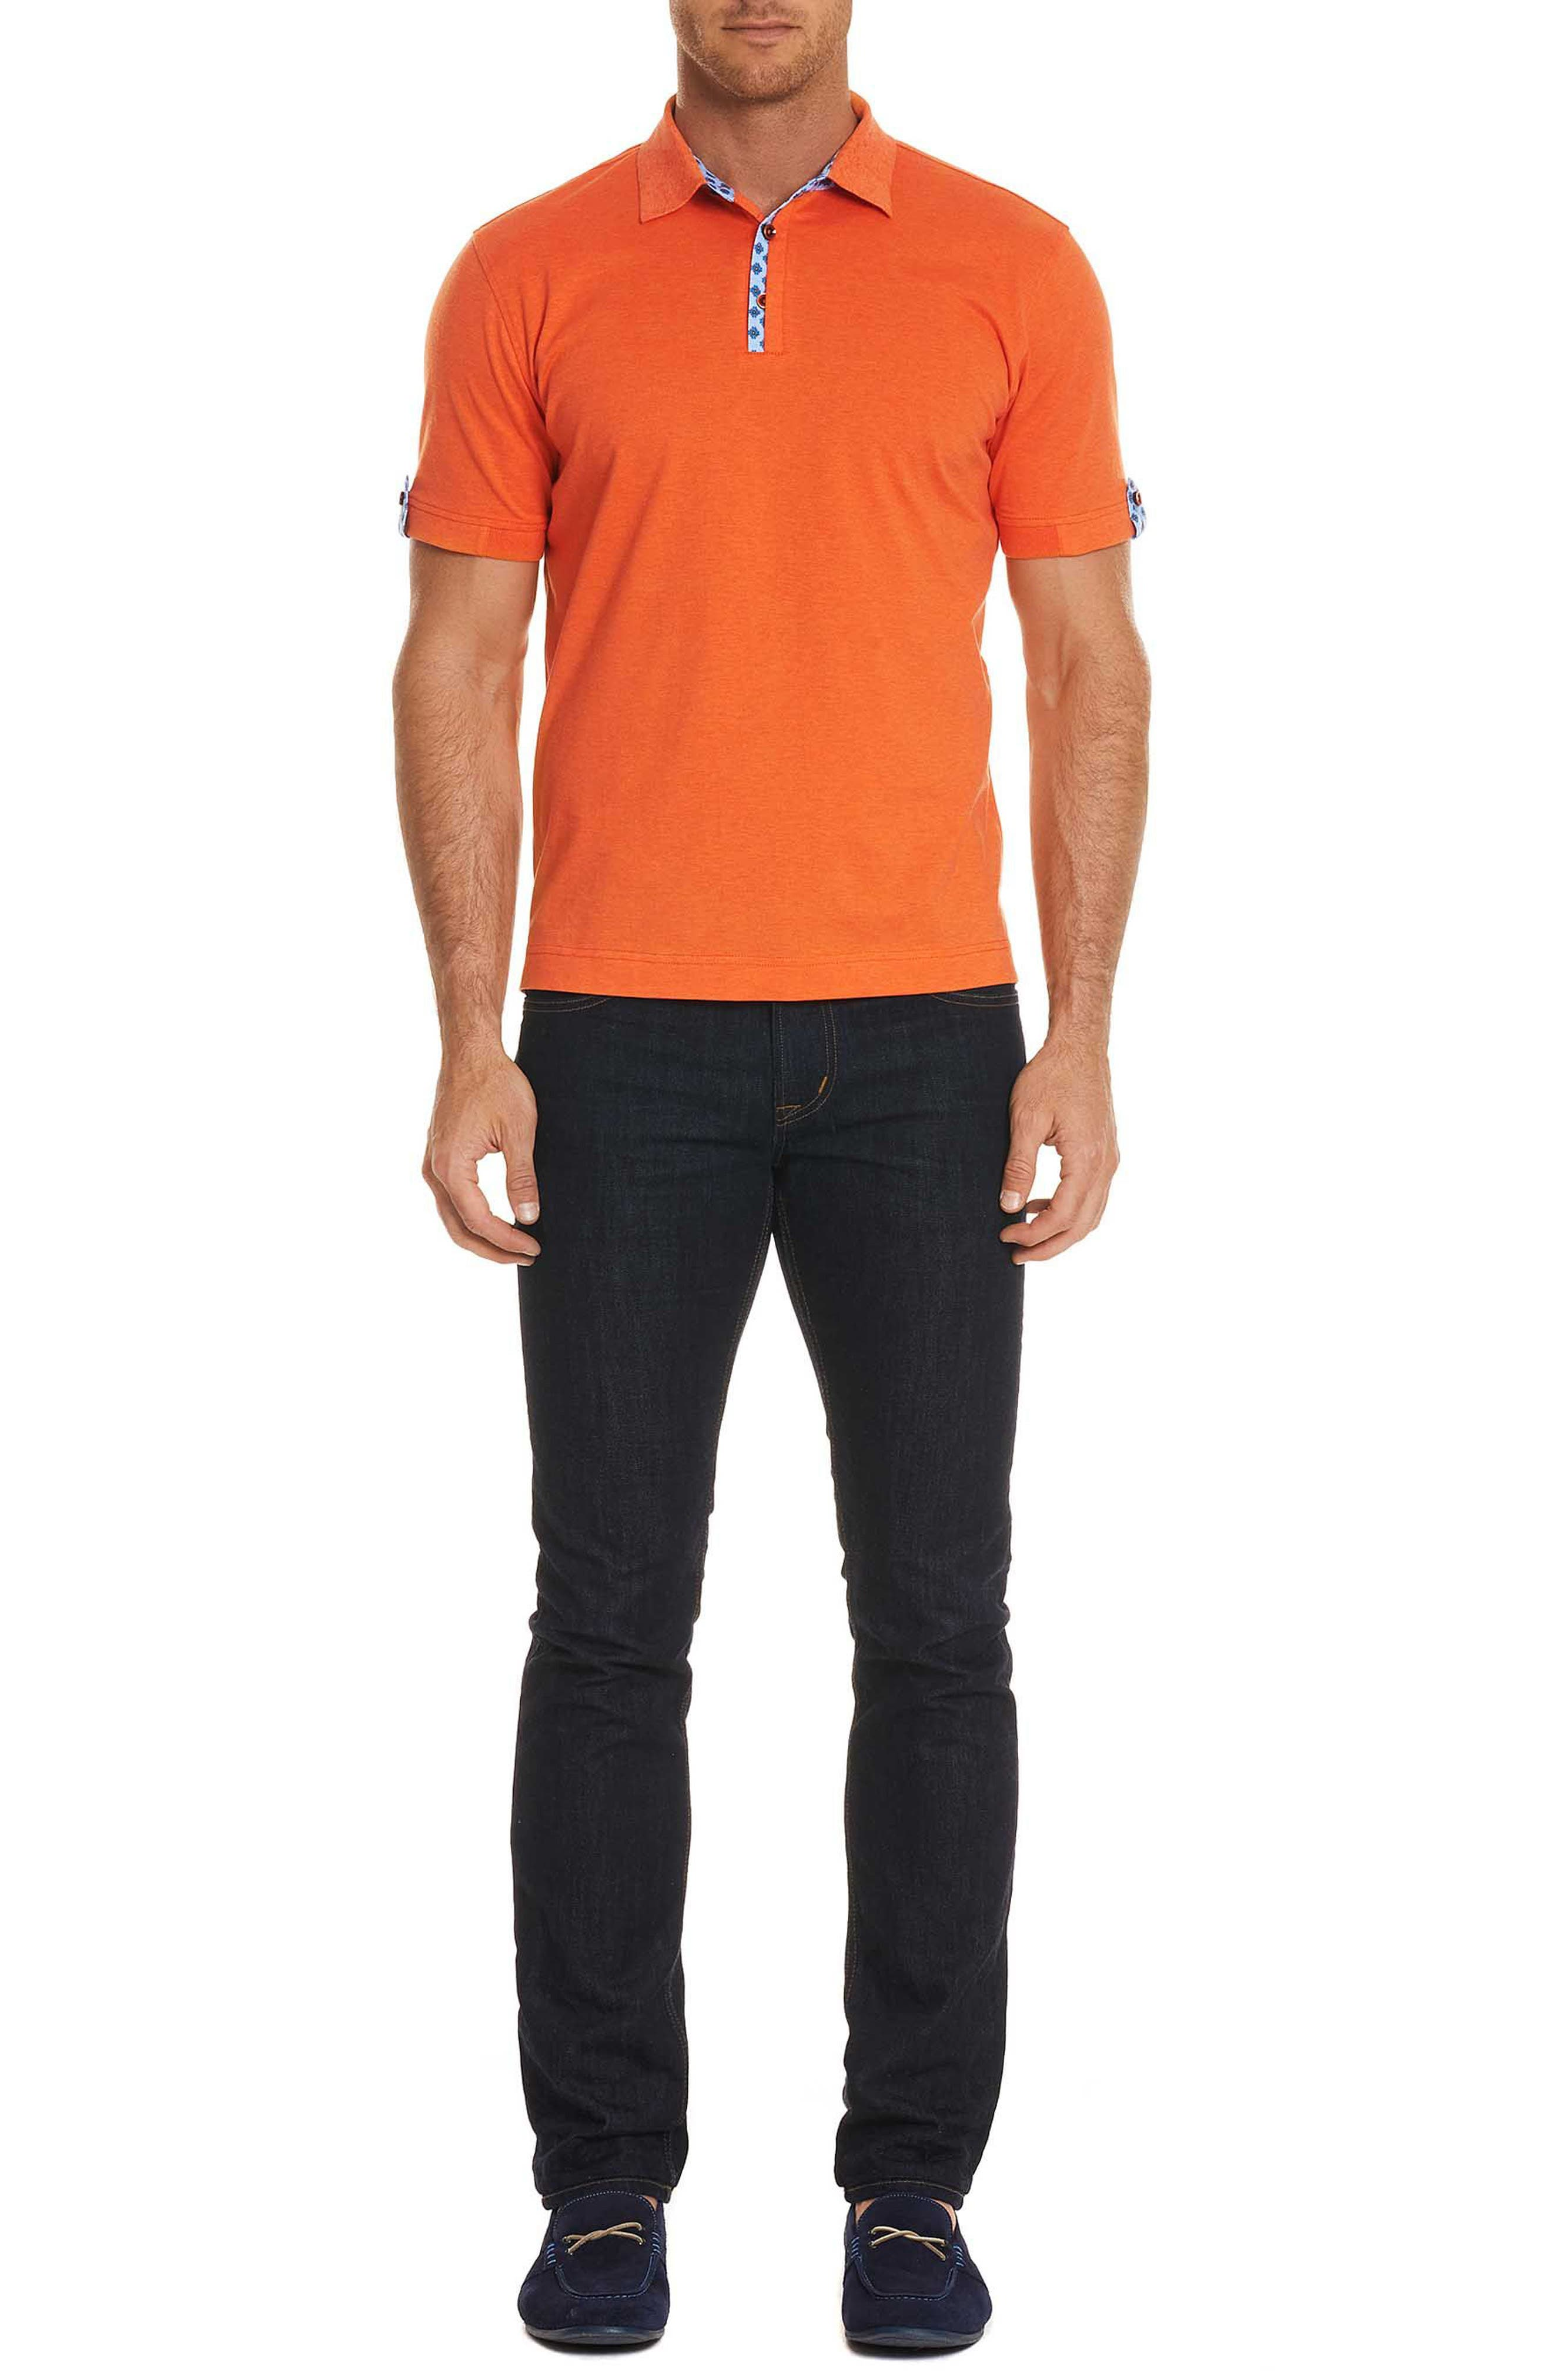 Diego Classic Fit Polo,                             Alternate thumbnail 6, color,                             Orange